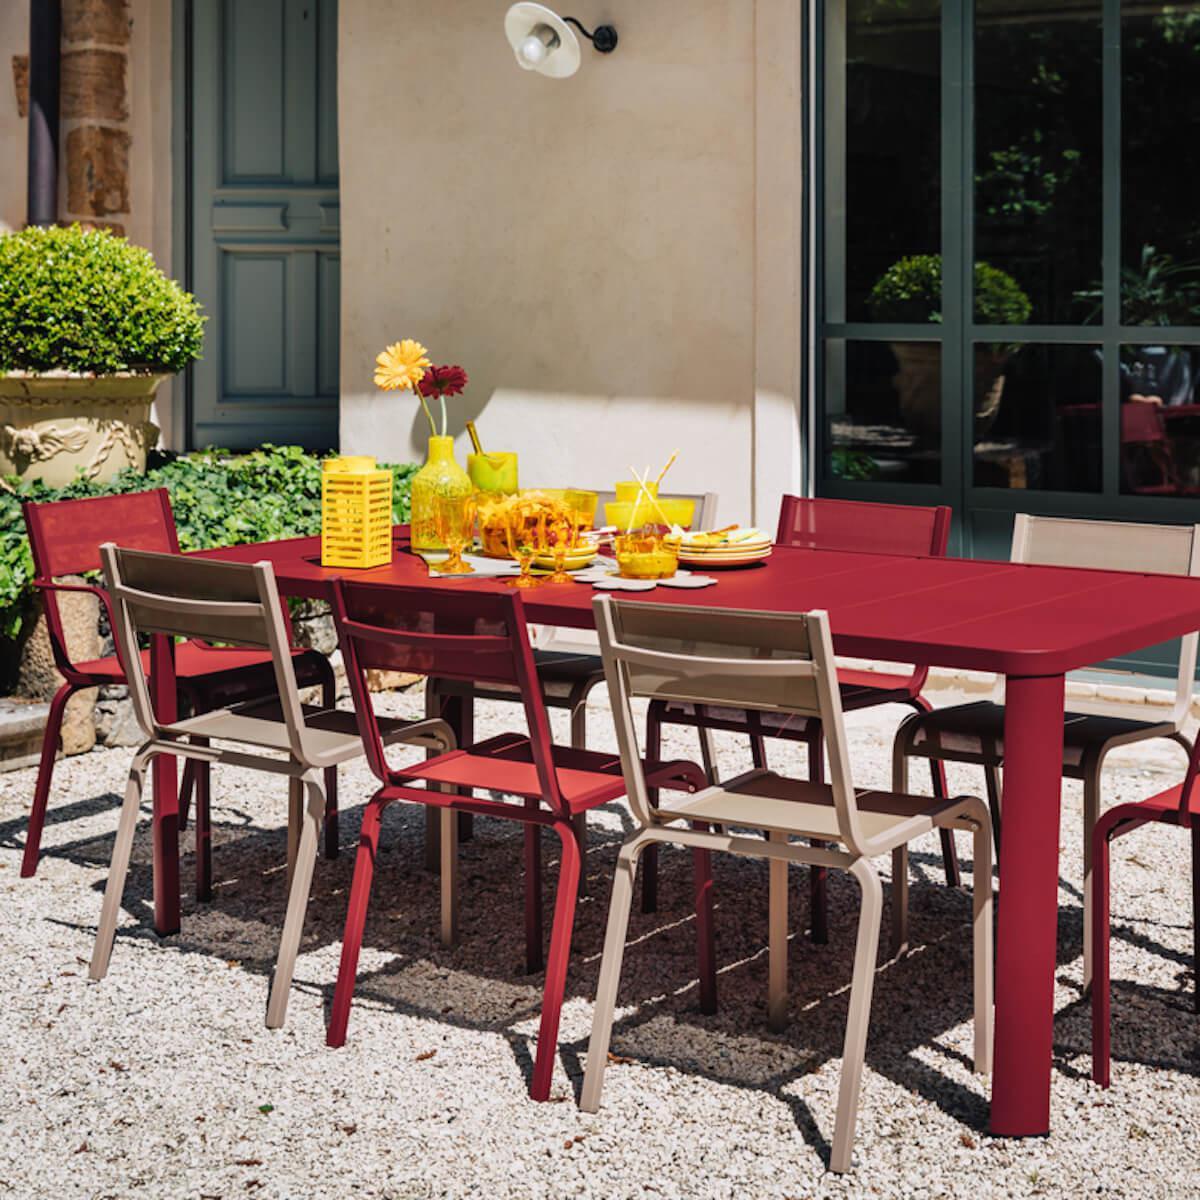 Table 205x100cm OLERON Fermob gris argile